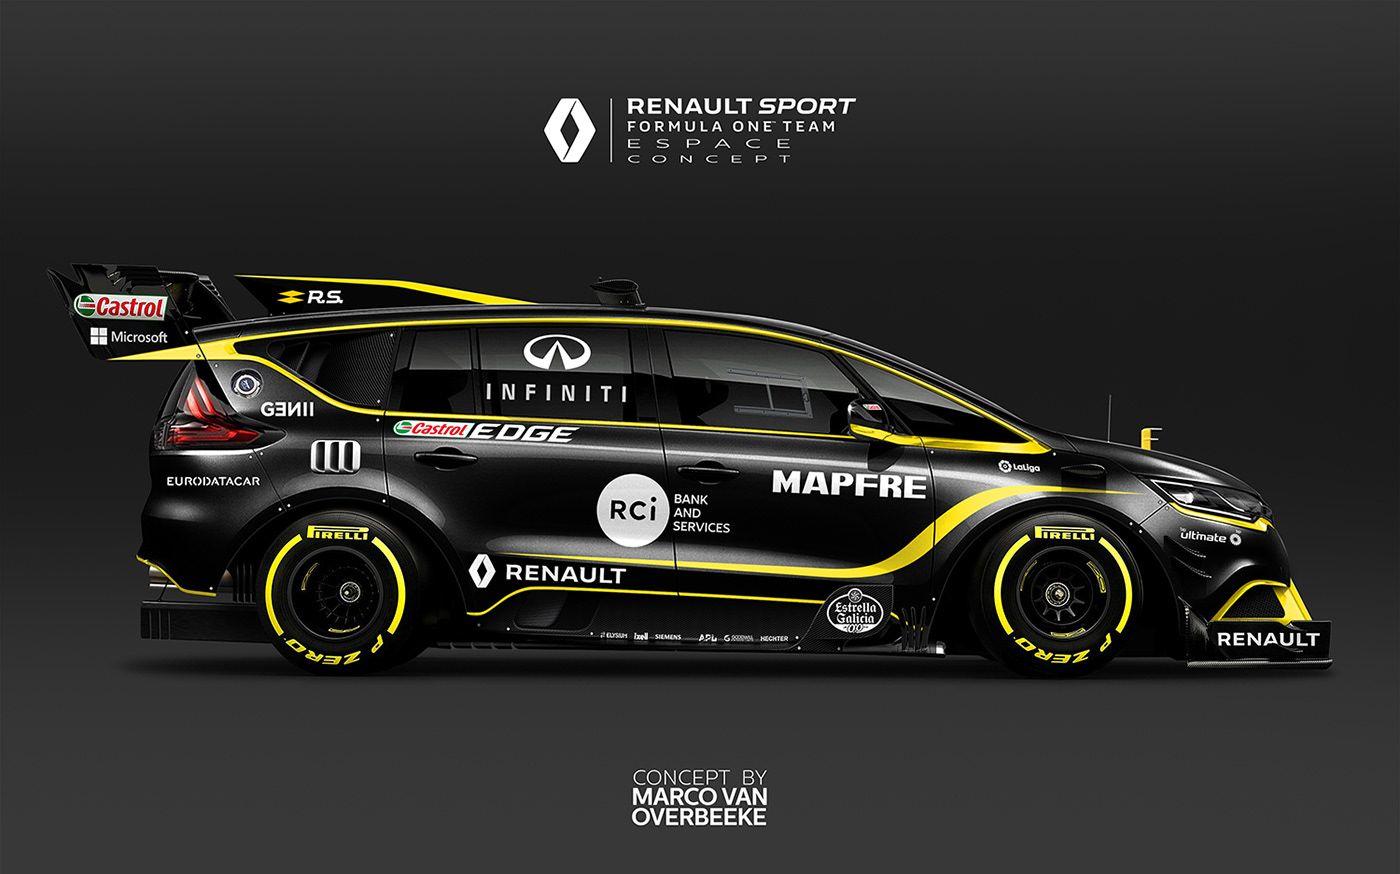 Renault Espace F1 R S 18 Formula One Livery Concept Espace F1 Renault Vehicle Signage [ 874 x 1400 Pixel ]